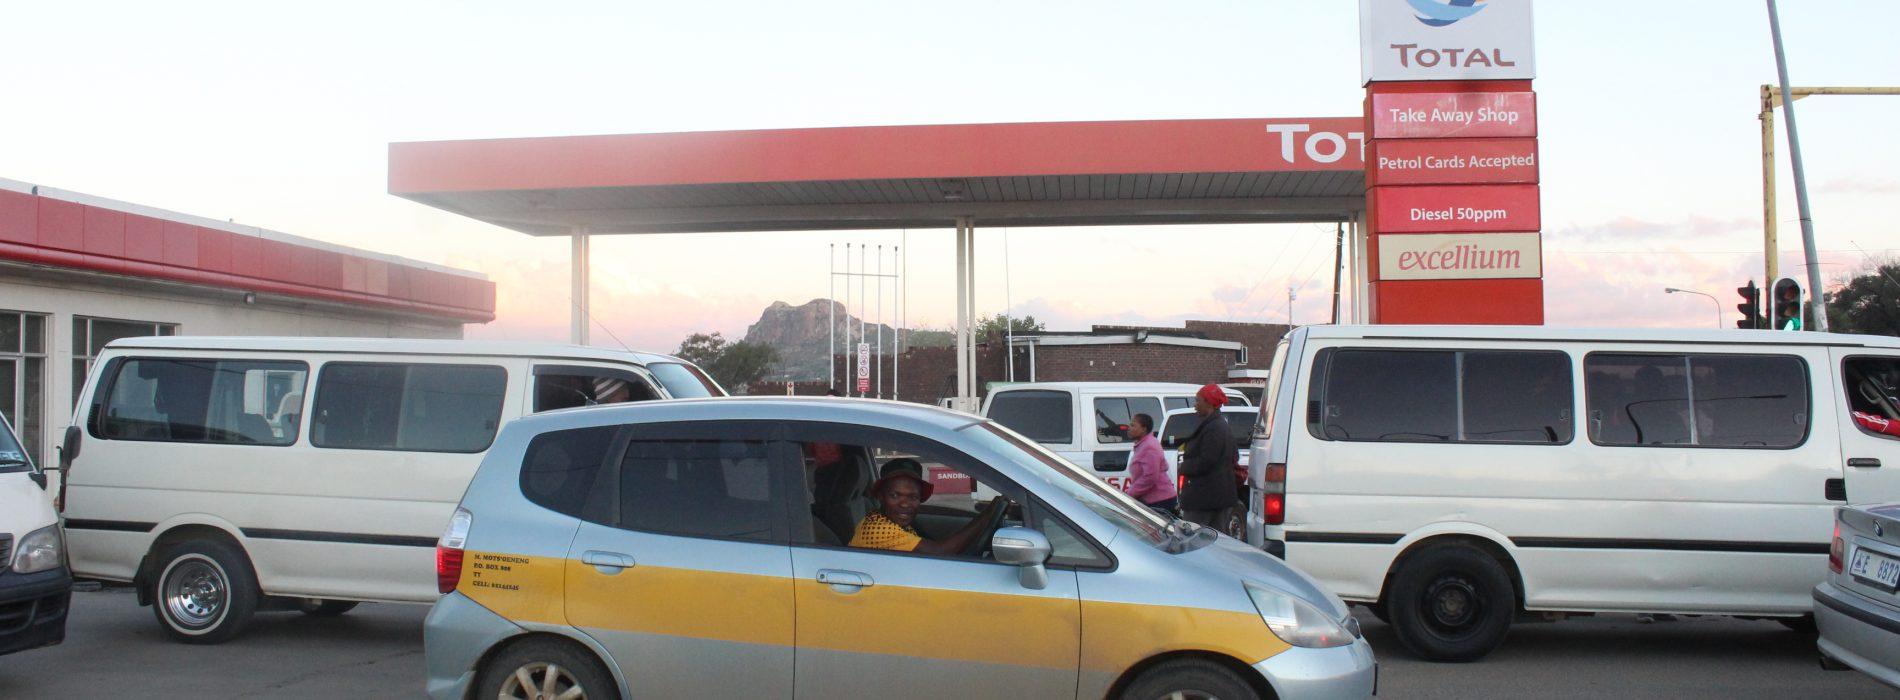 Total Lesotho boss in trouble